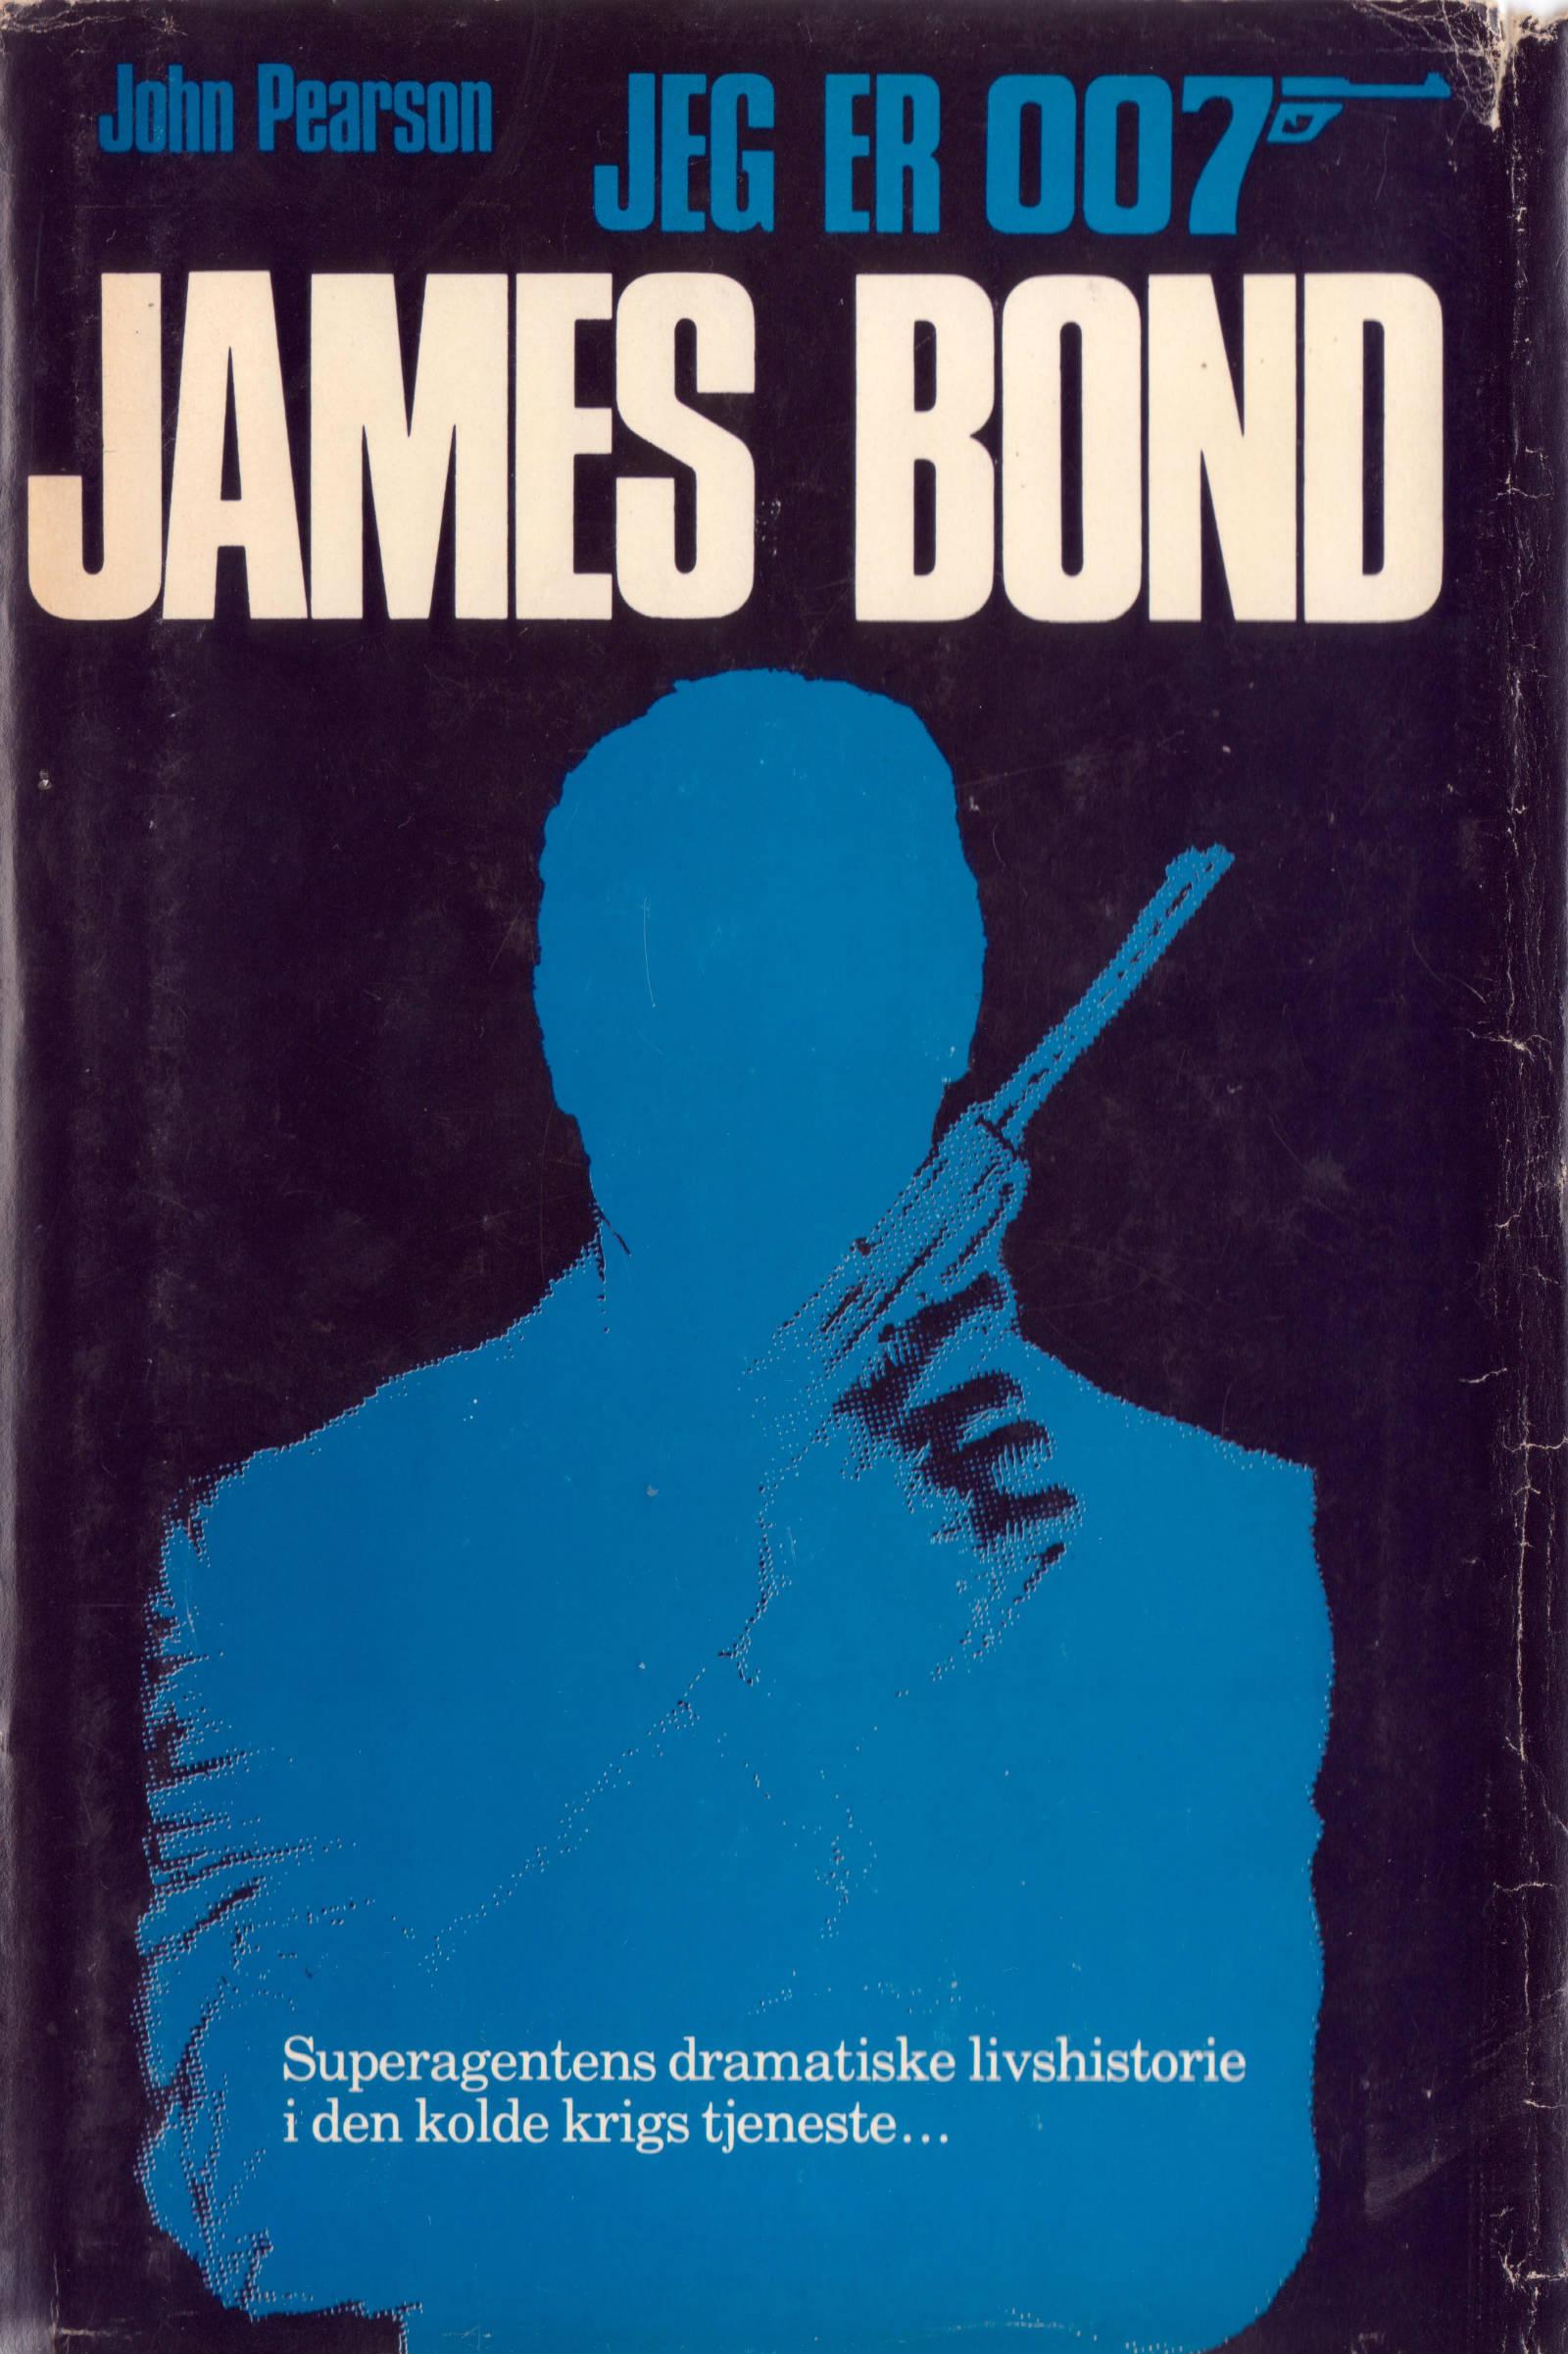 Jeg er 007 James Bond DK forside